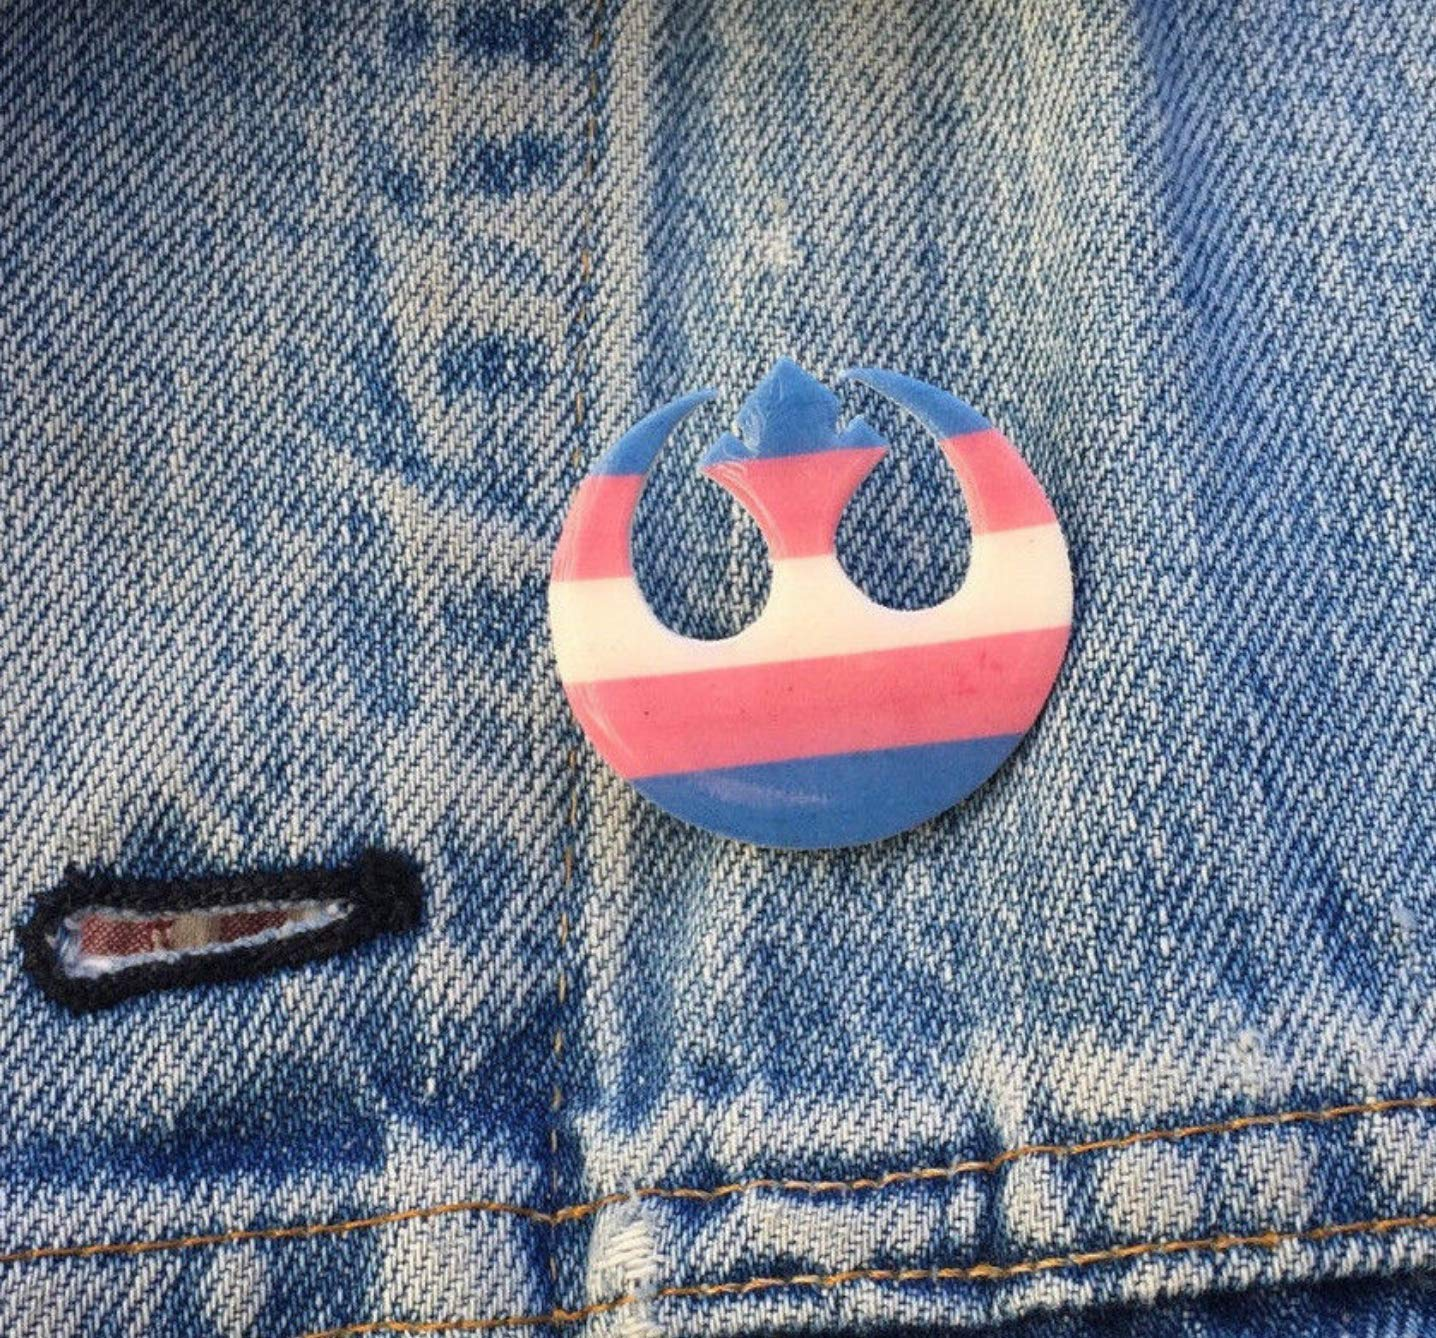 13a75f18bd574 Amazon.com: Star Wars Rebel Alliance Transgender Flag Ally Pride Pin ...